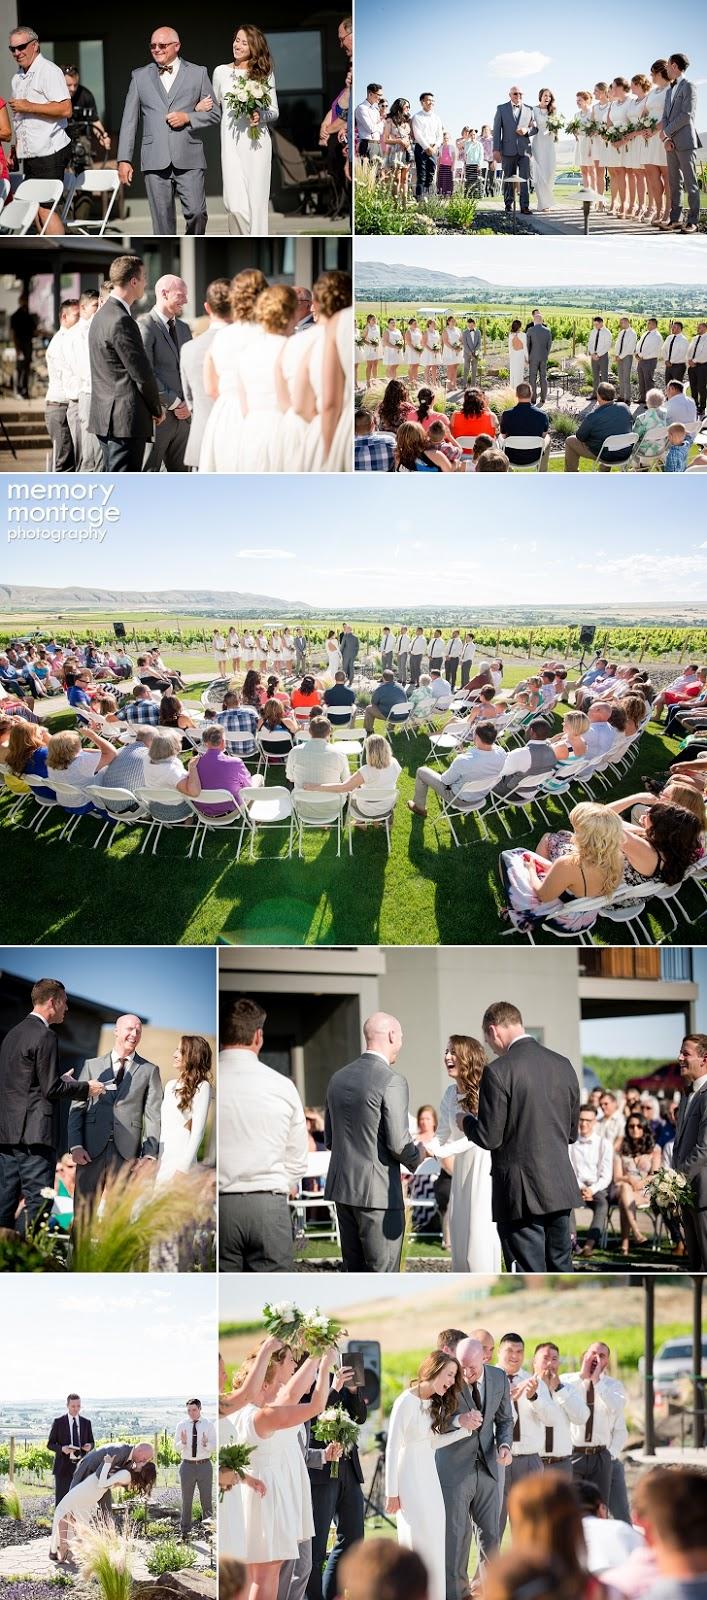 Benton City Winery Wedding, Richland Wedding Photographer, Tri-Cities Wedding Photography, Tri-Cities Wedding Photographers, Memory Montage Photography, Chic Winery Wedding, www.memorymp.com